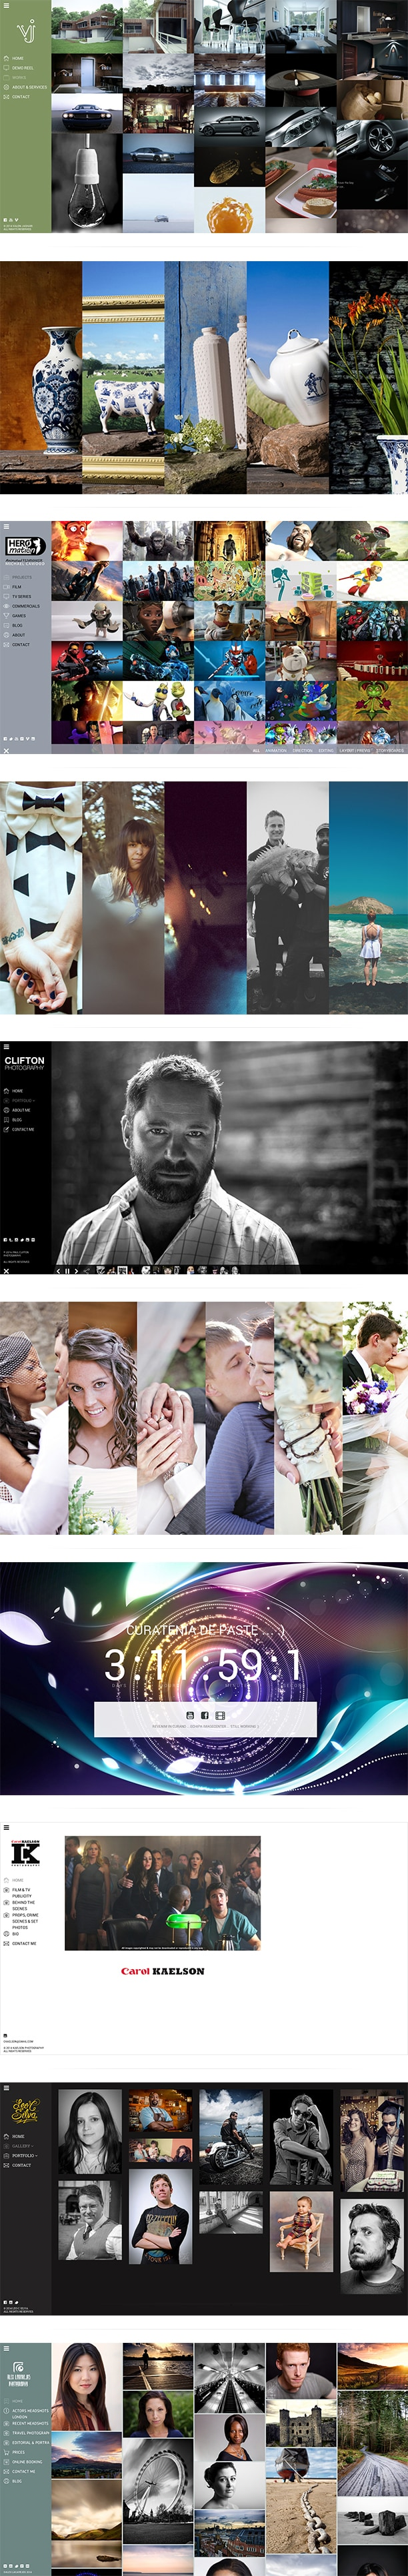 eClipse - محفظة التصوير الفوتوغرافي - 3